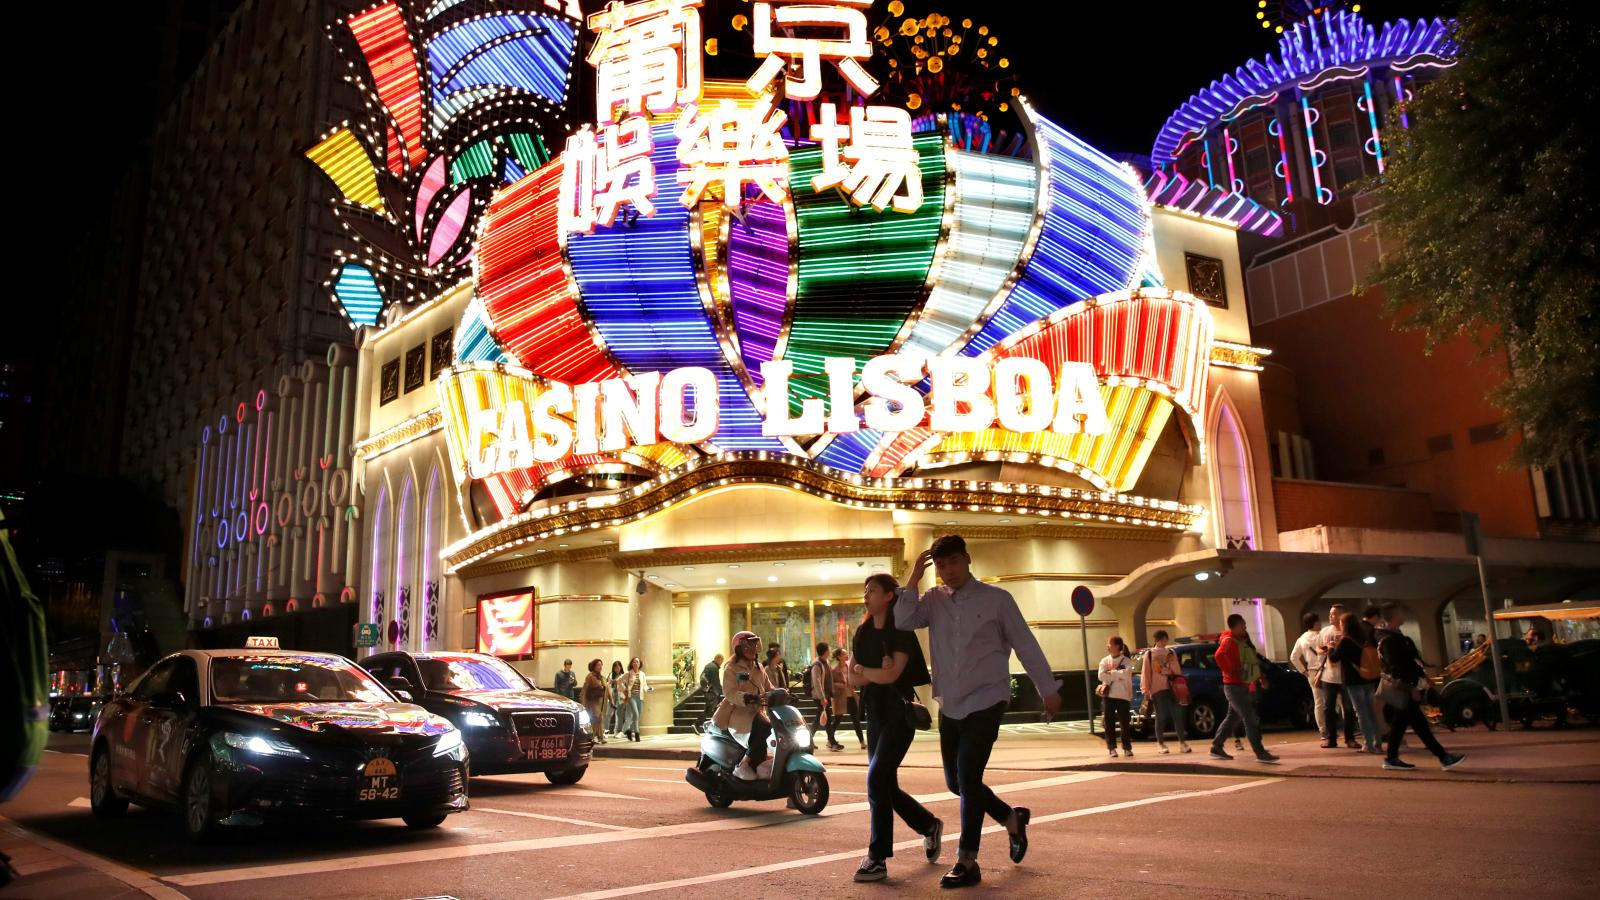 Macau Online Casino